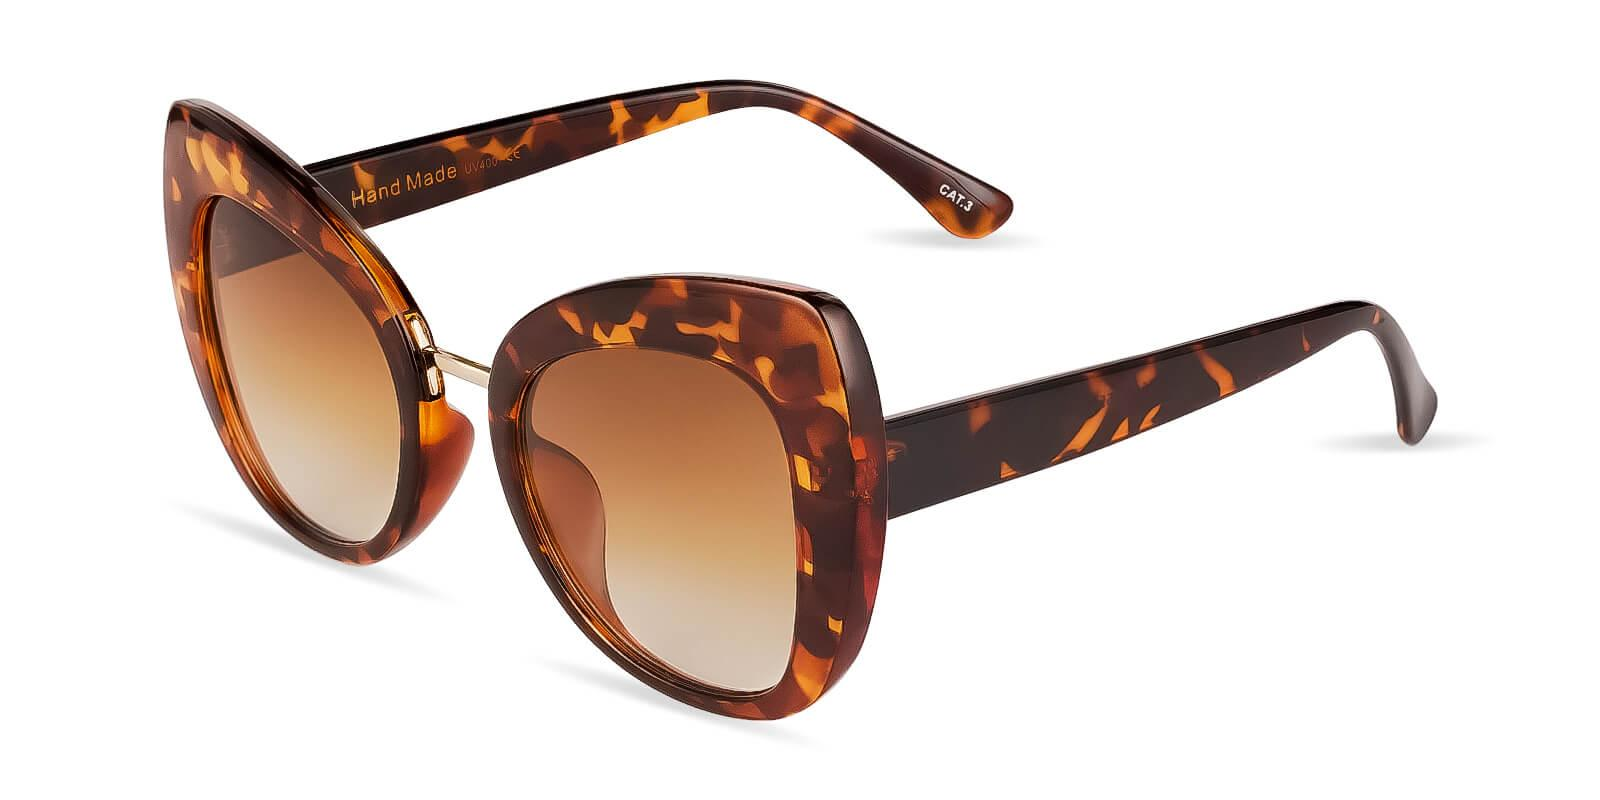 Safari Leopard Plastic Fashion , Sunglasses Frames from ABBE Glasses